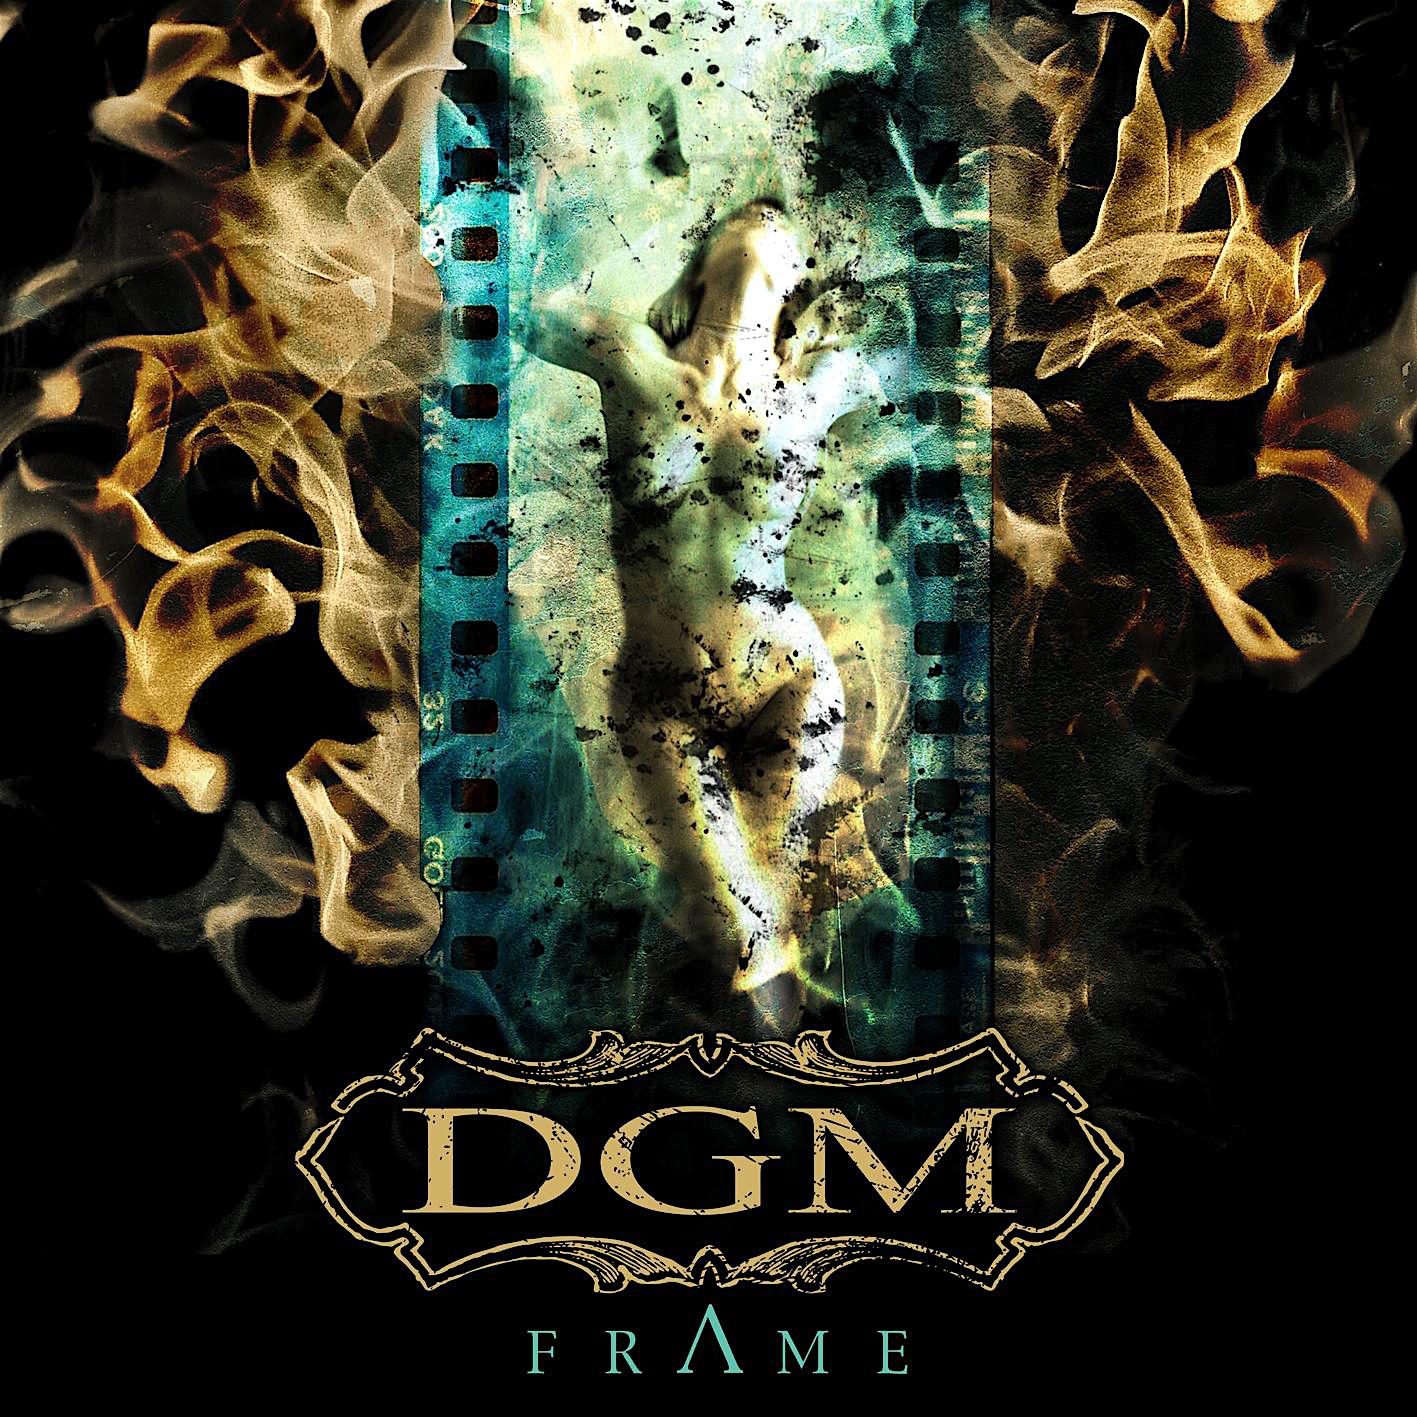 DGM - FrAme cover